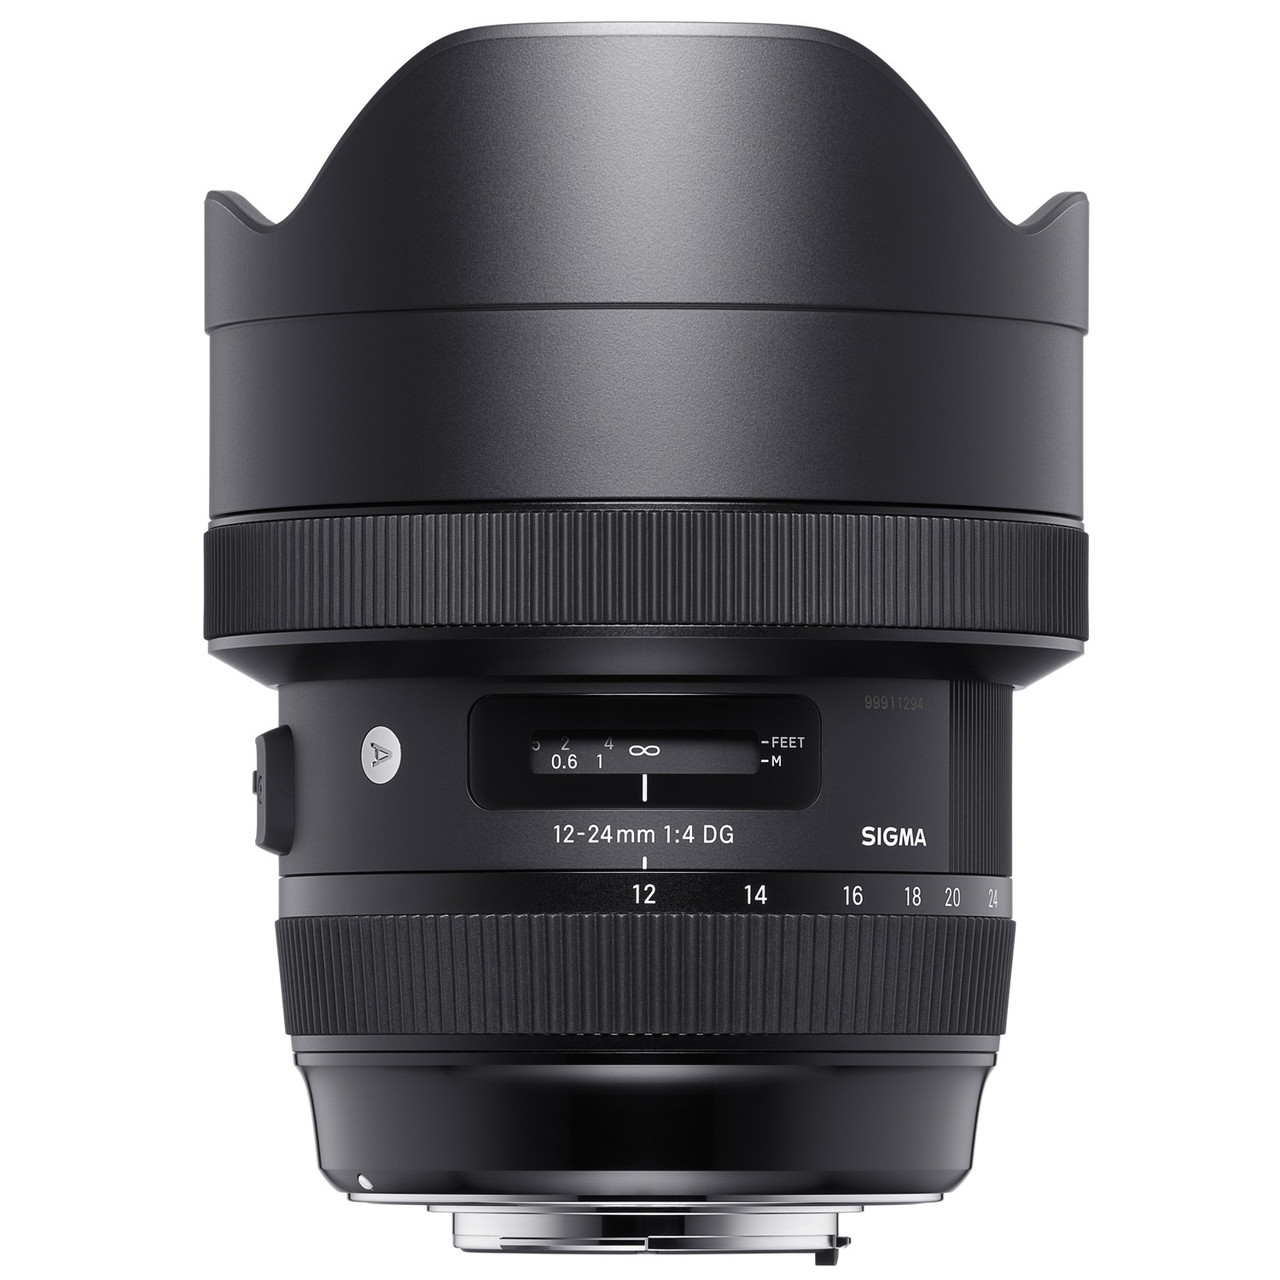 Sigma 12-24mm F4.0 DG HSM Art for Nikon